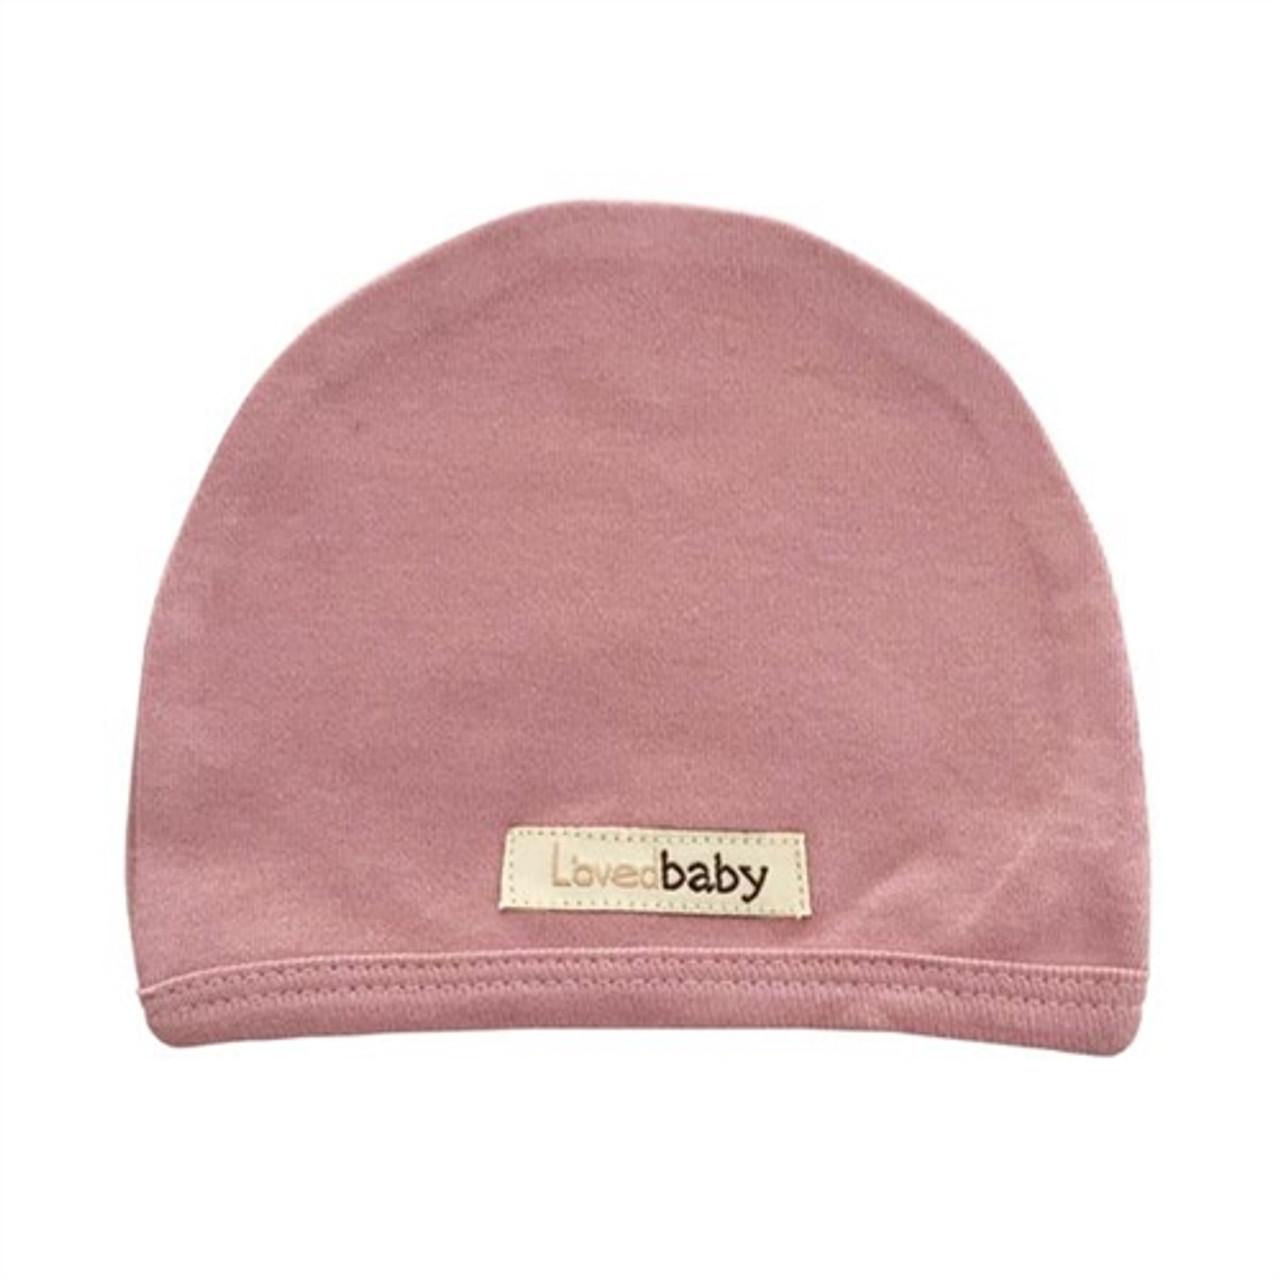 Organic Baby Hat - Mauve, NB-3m